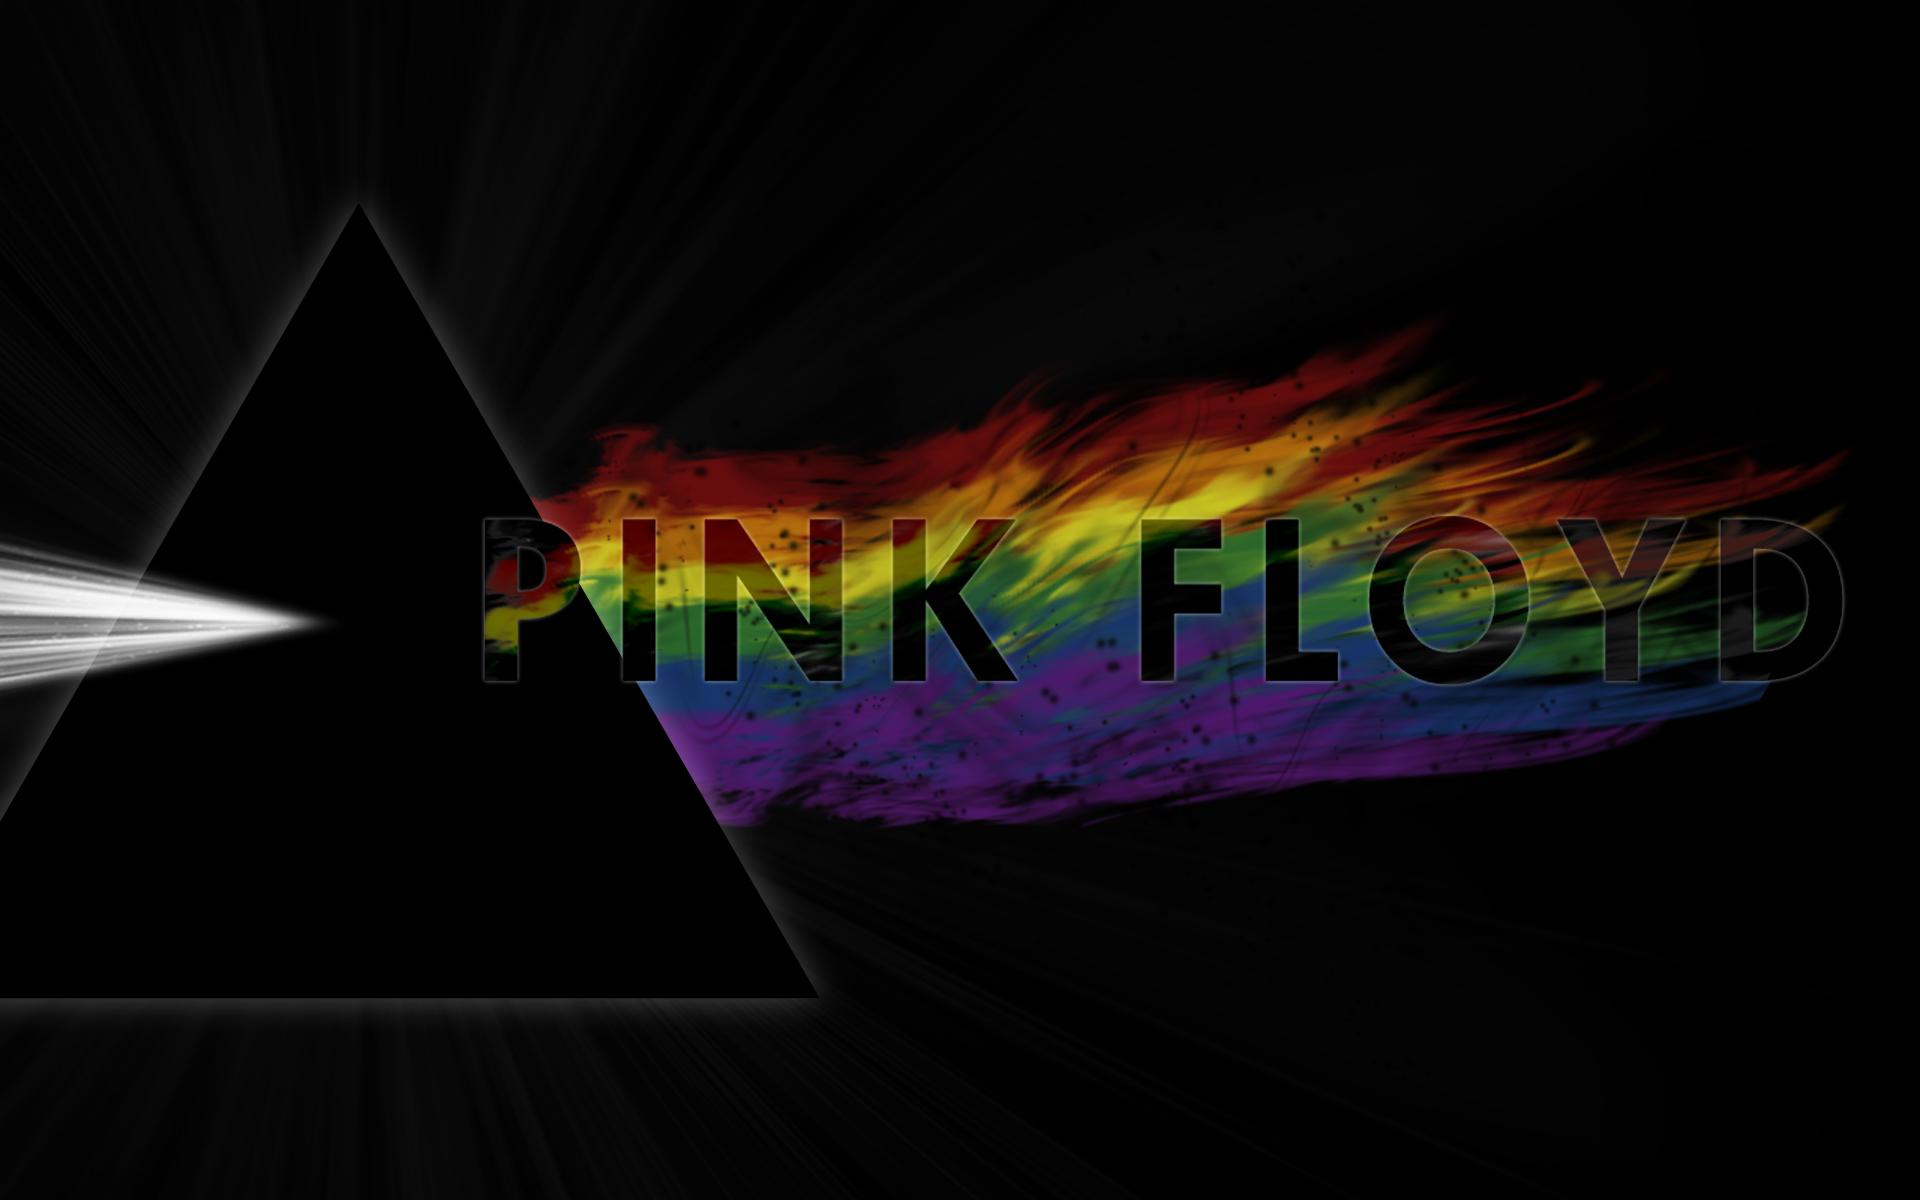 iphone 6 wallpaper pink floyd